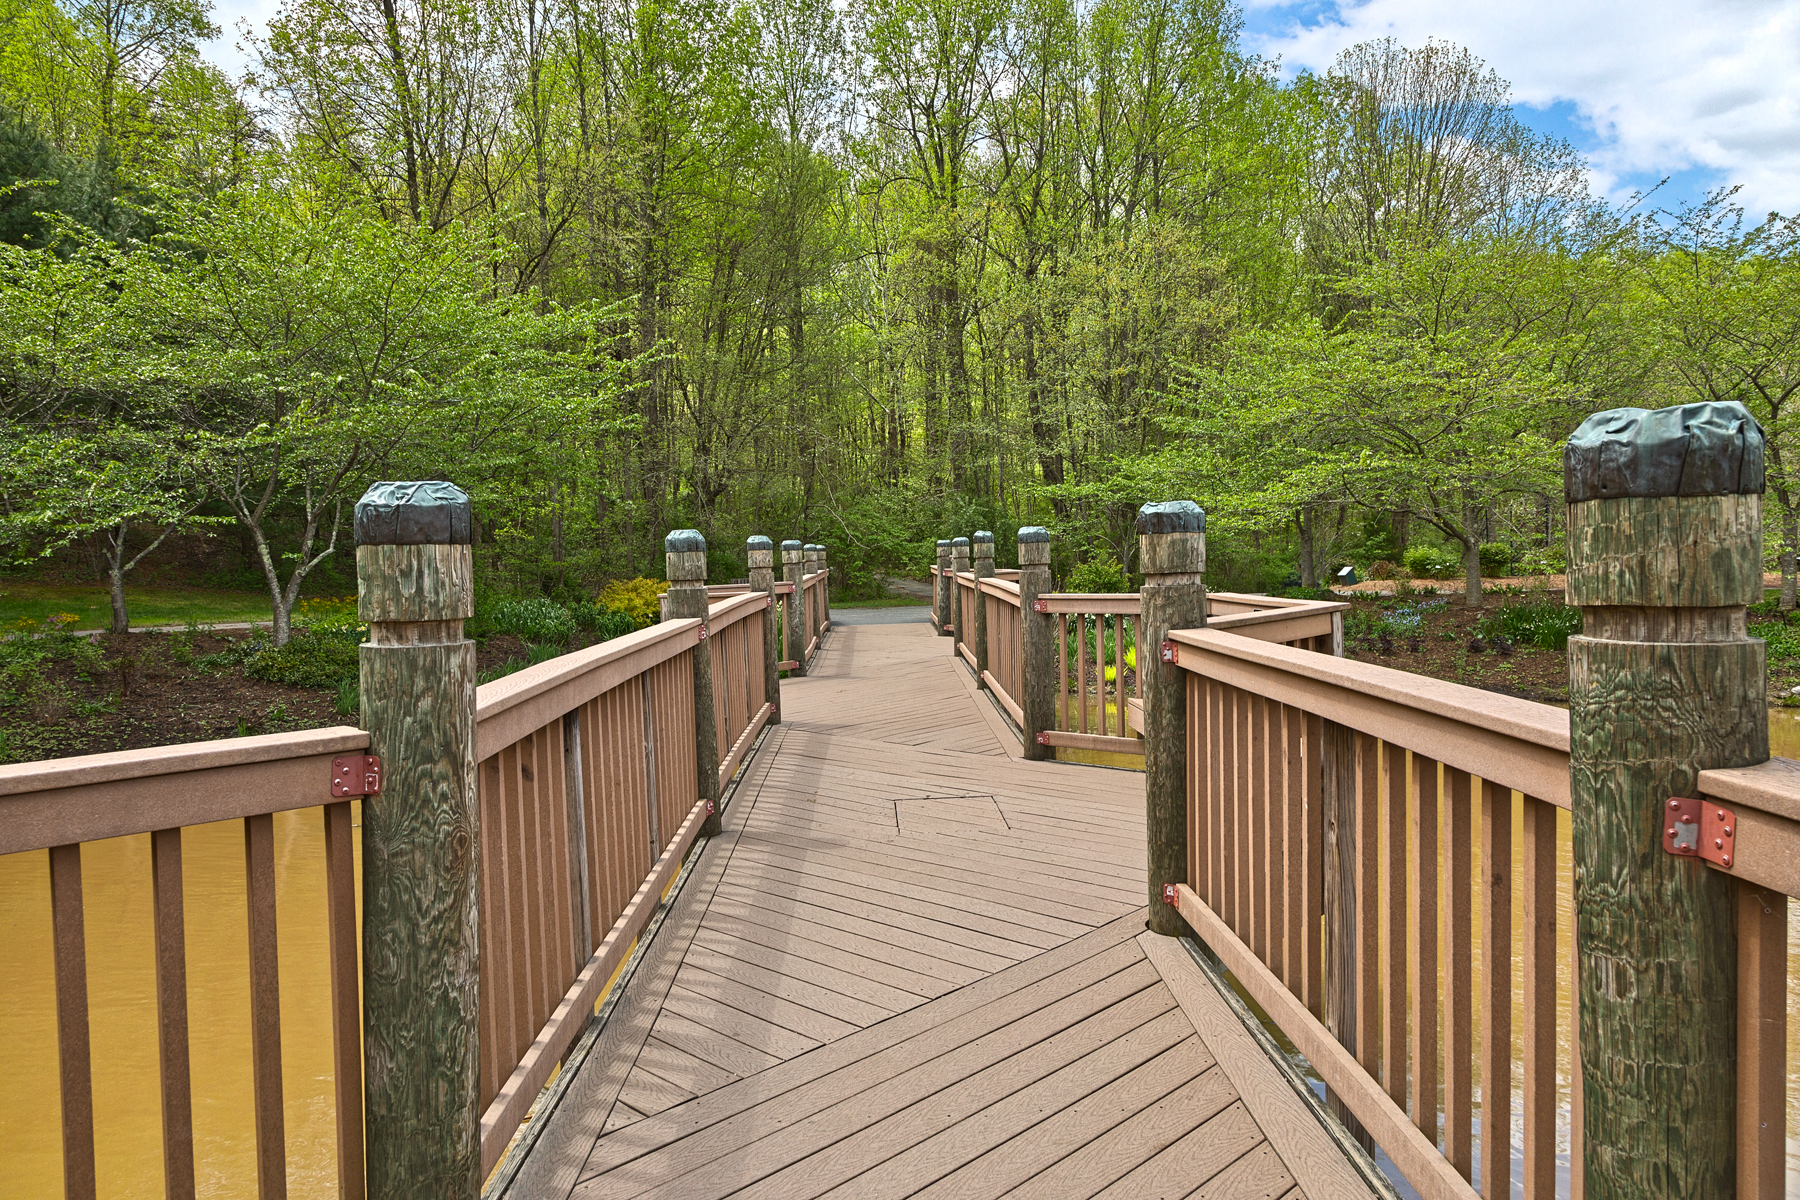 Meadowlark gardens bridge - hdr photo